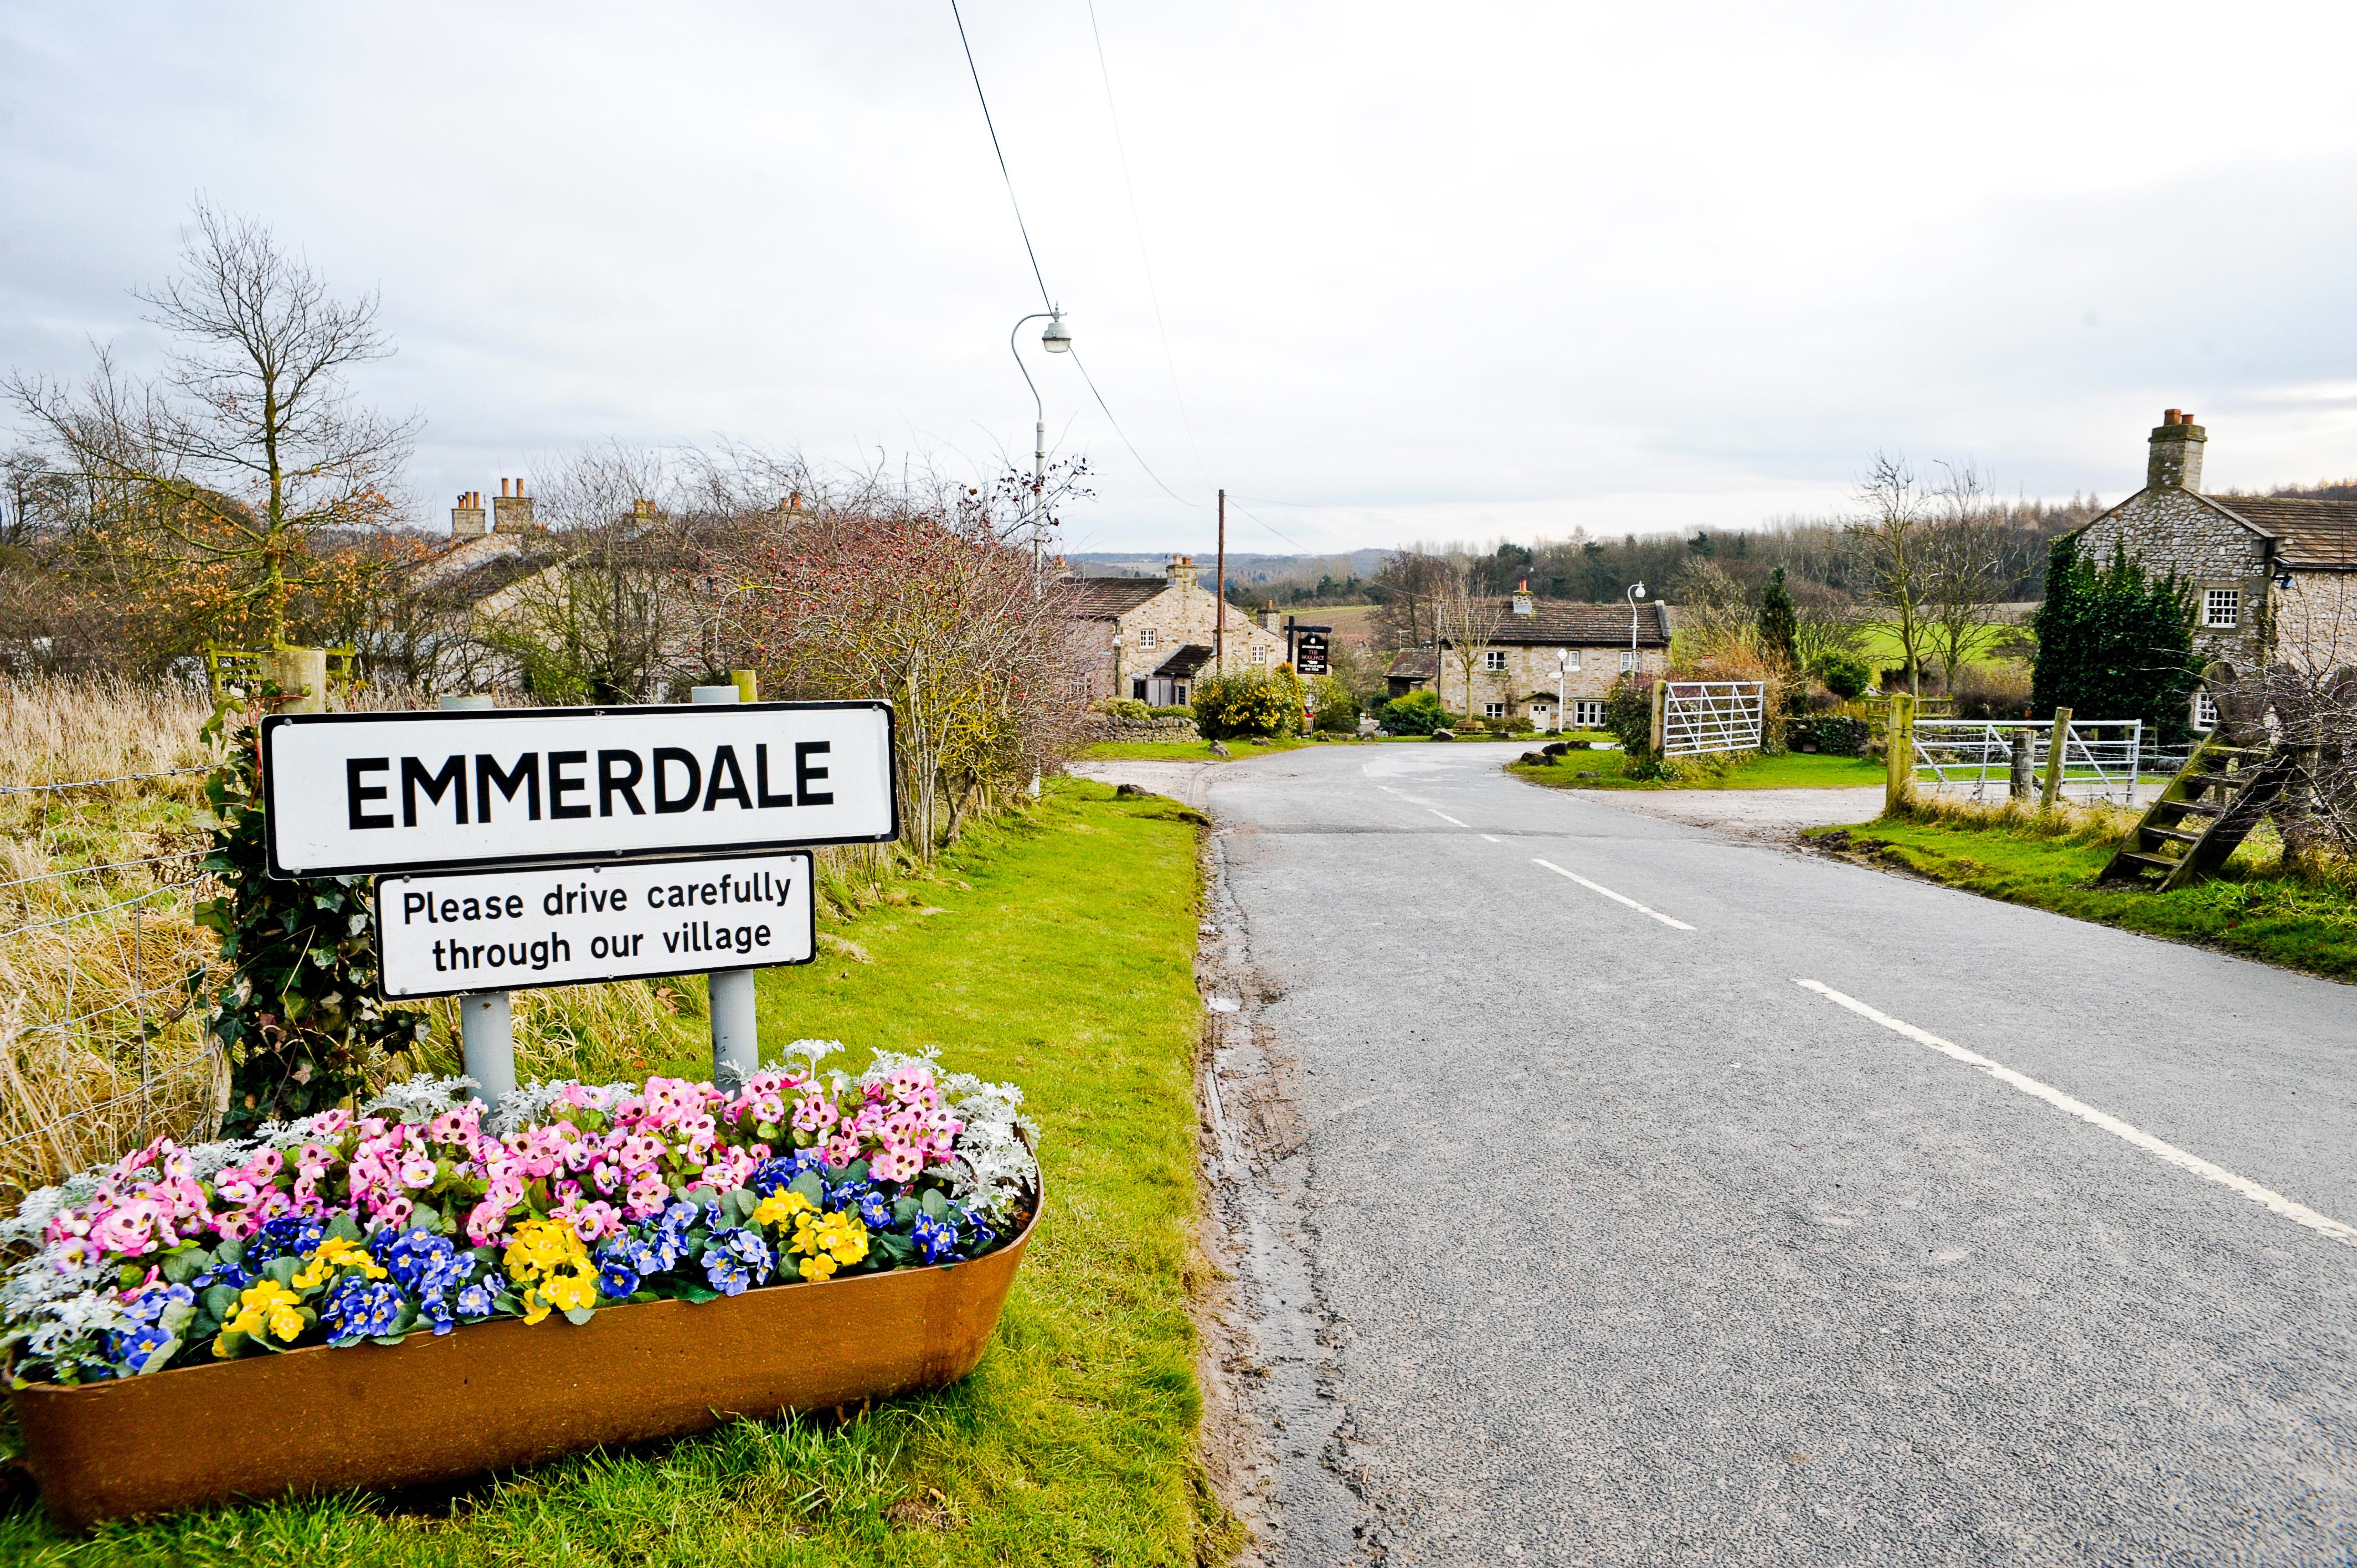 Emmerdale_Sign_Flowers.jpeg